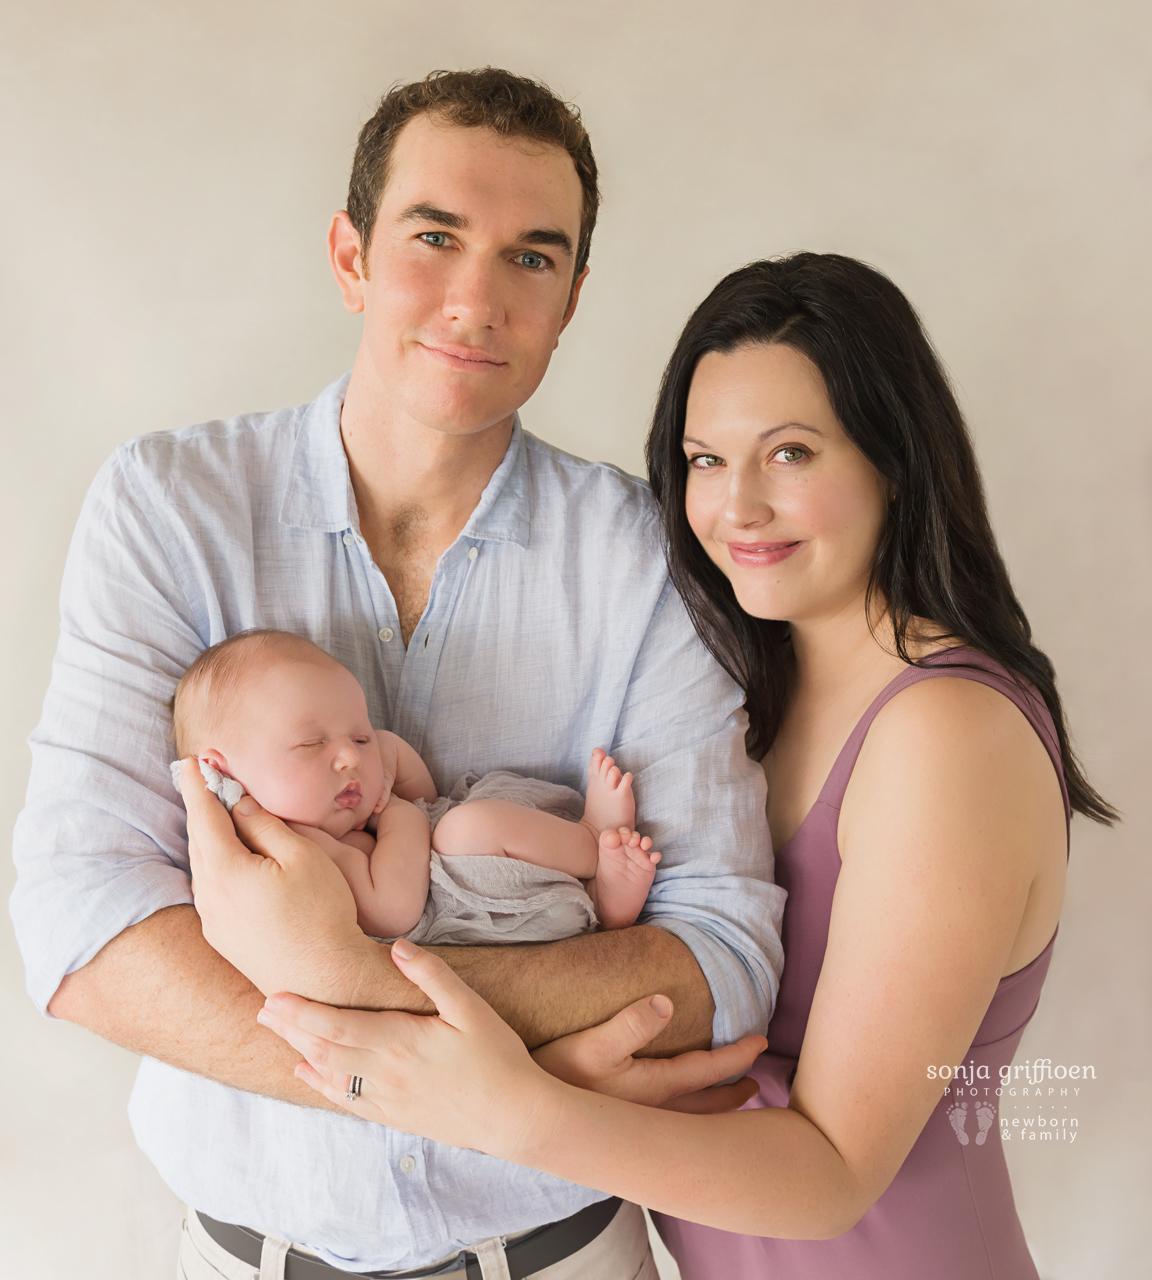 Flynn-Newborn-Brisbane-Newborn-Photographer-Sonja-Griffioen-08.jpg